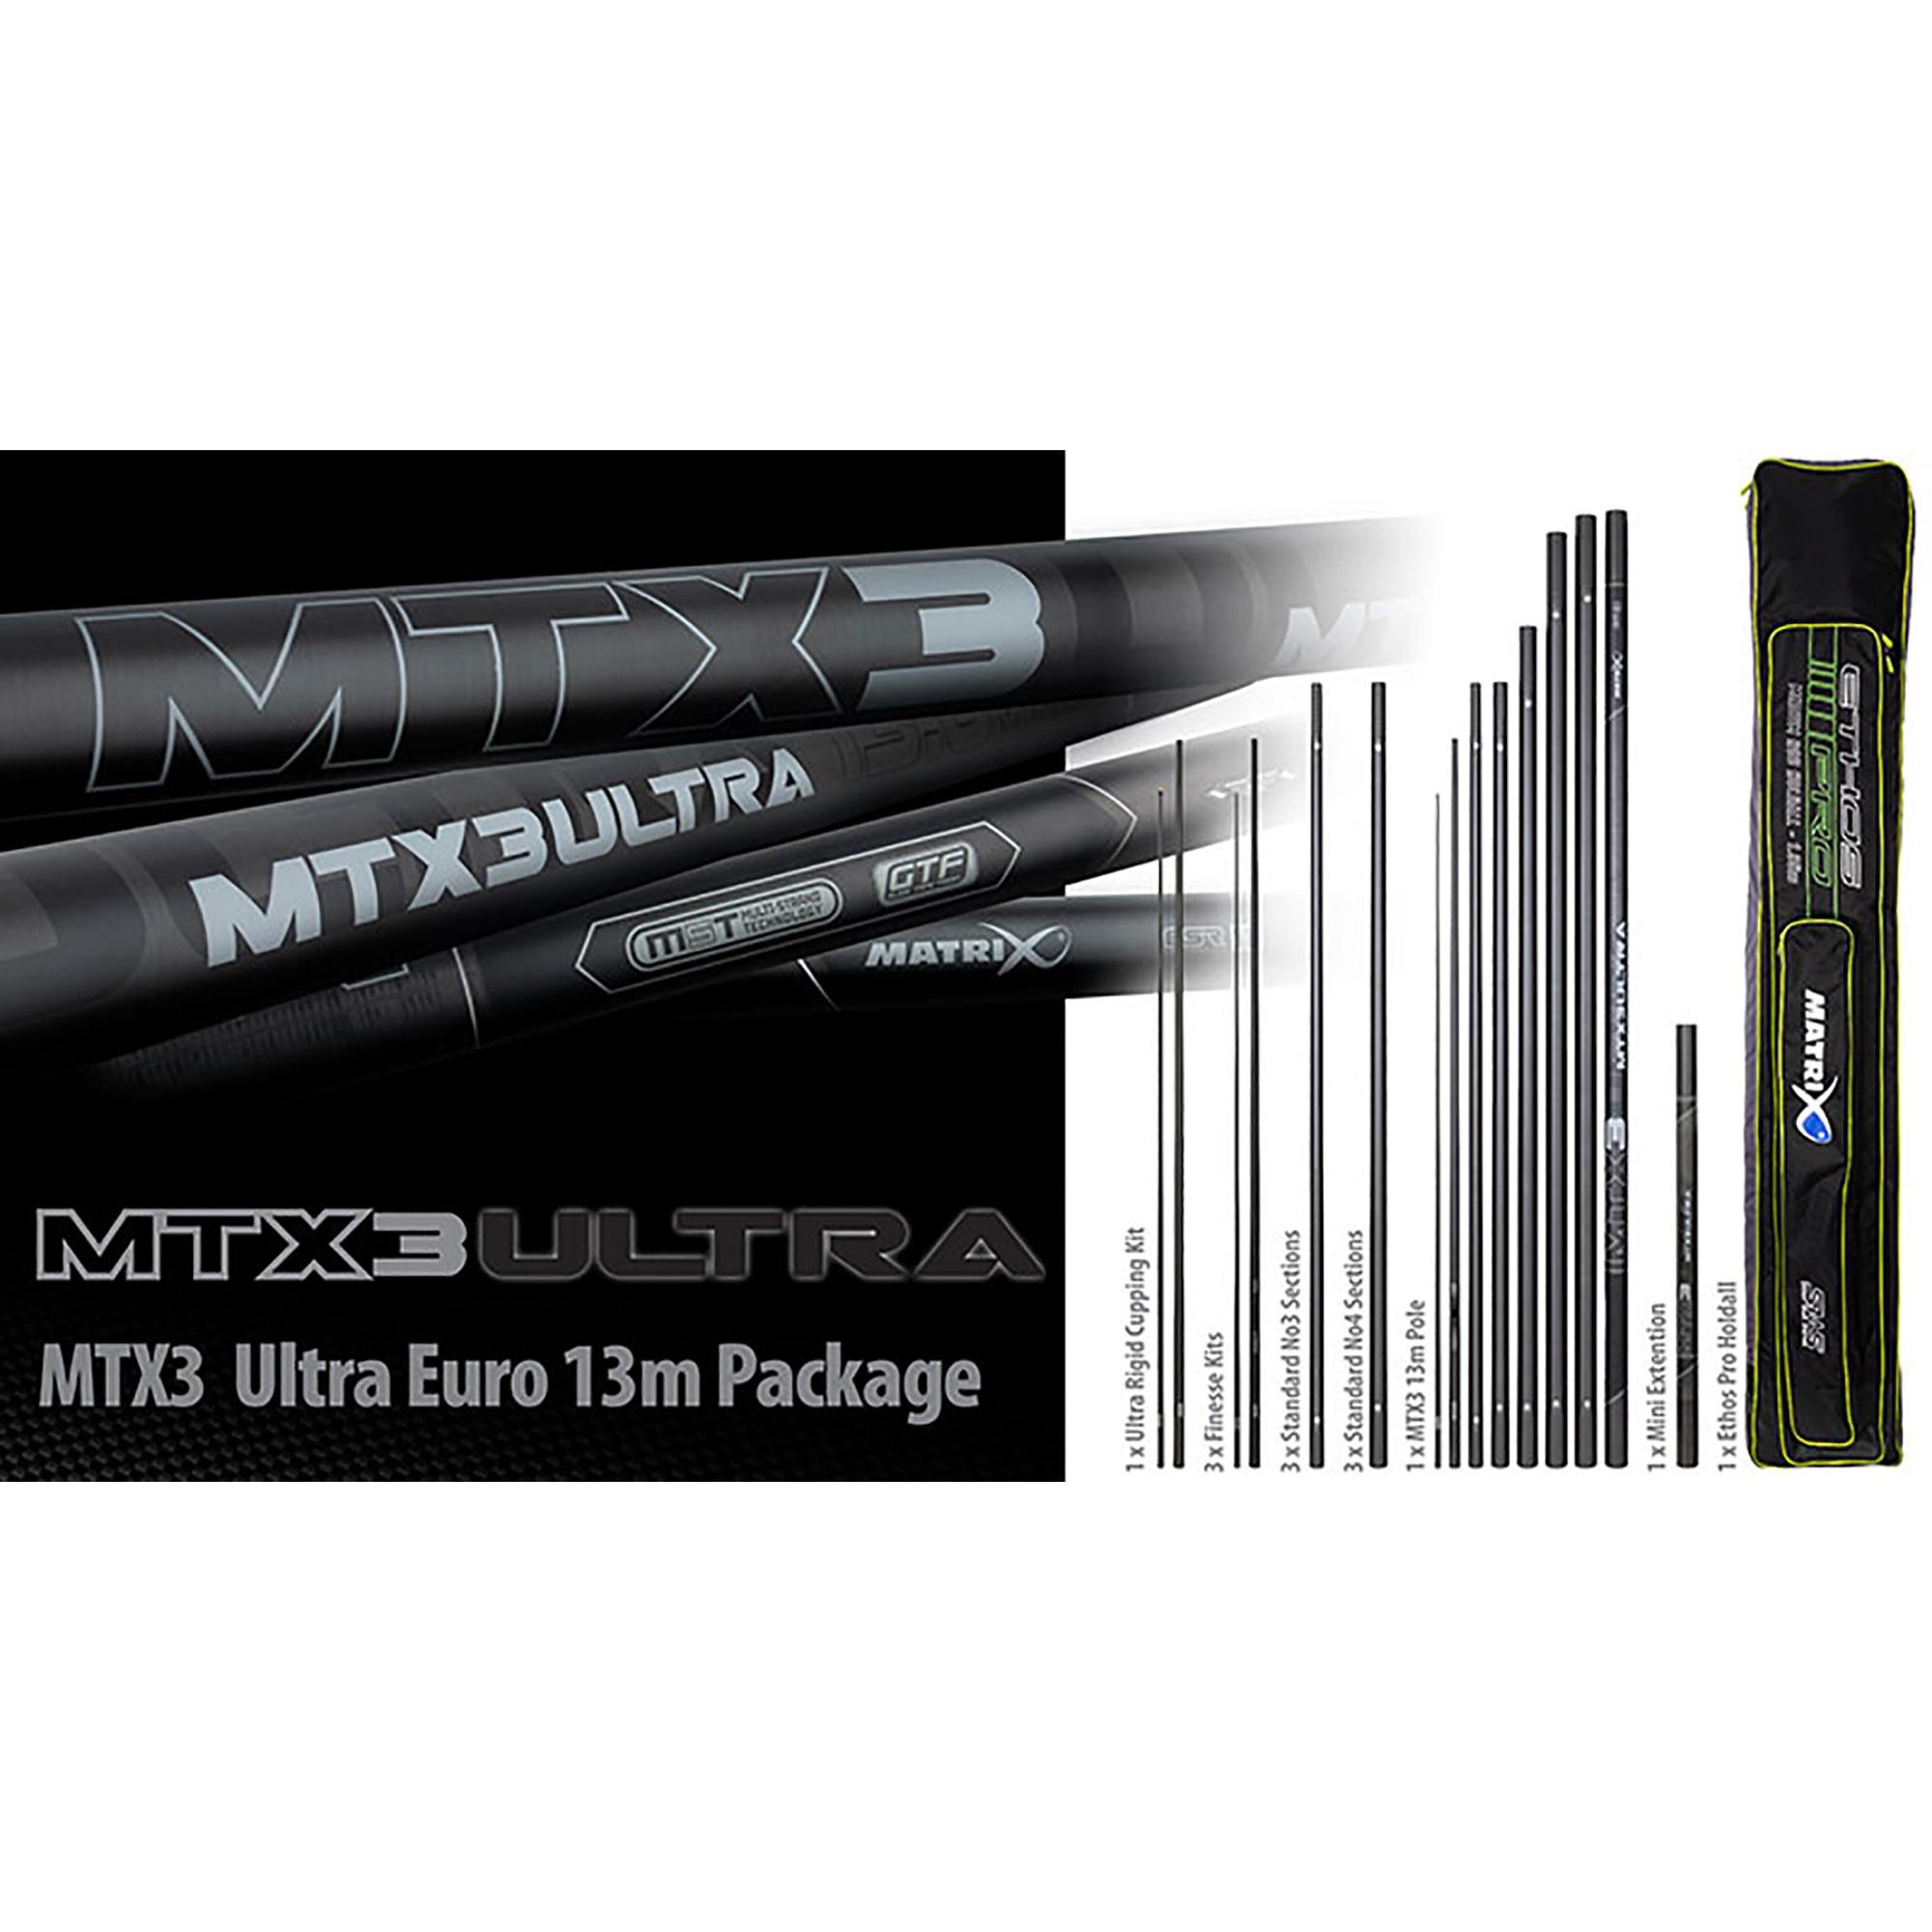 Pack Roubaisienne MTX3 Ultra Pole MATRIX (13,00 mt)